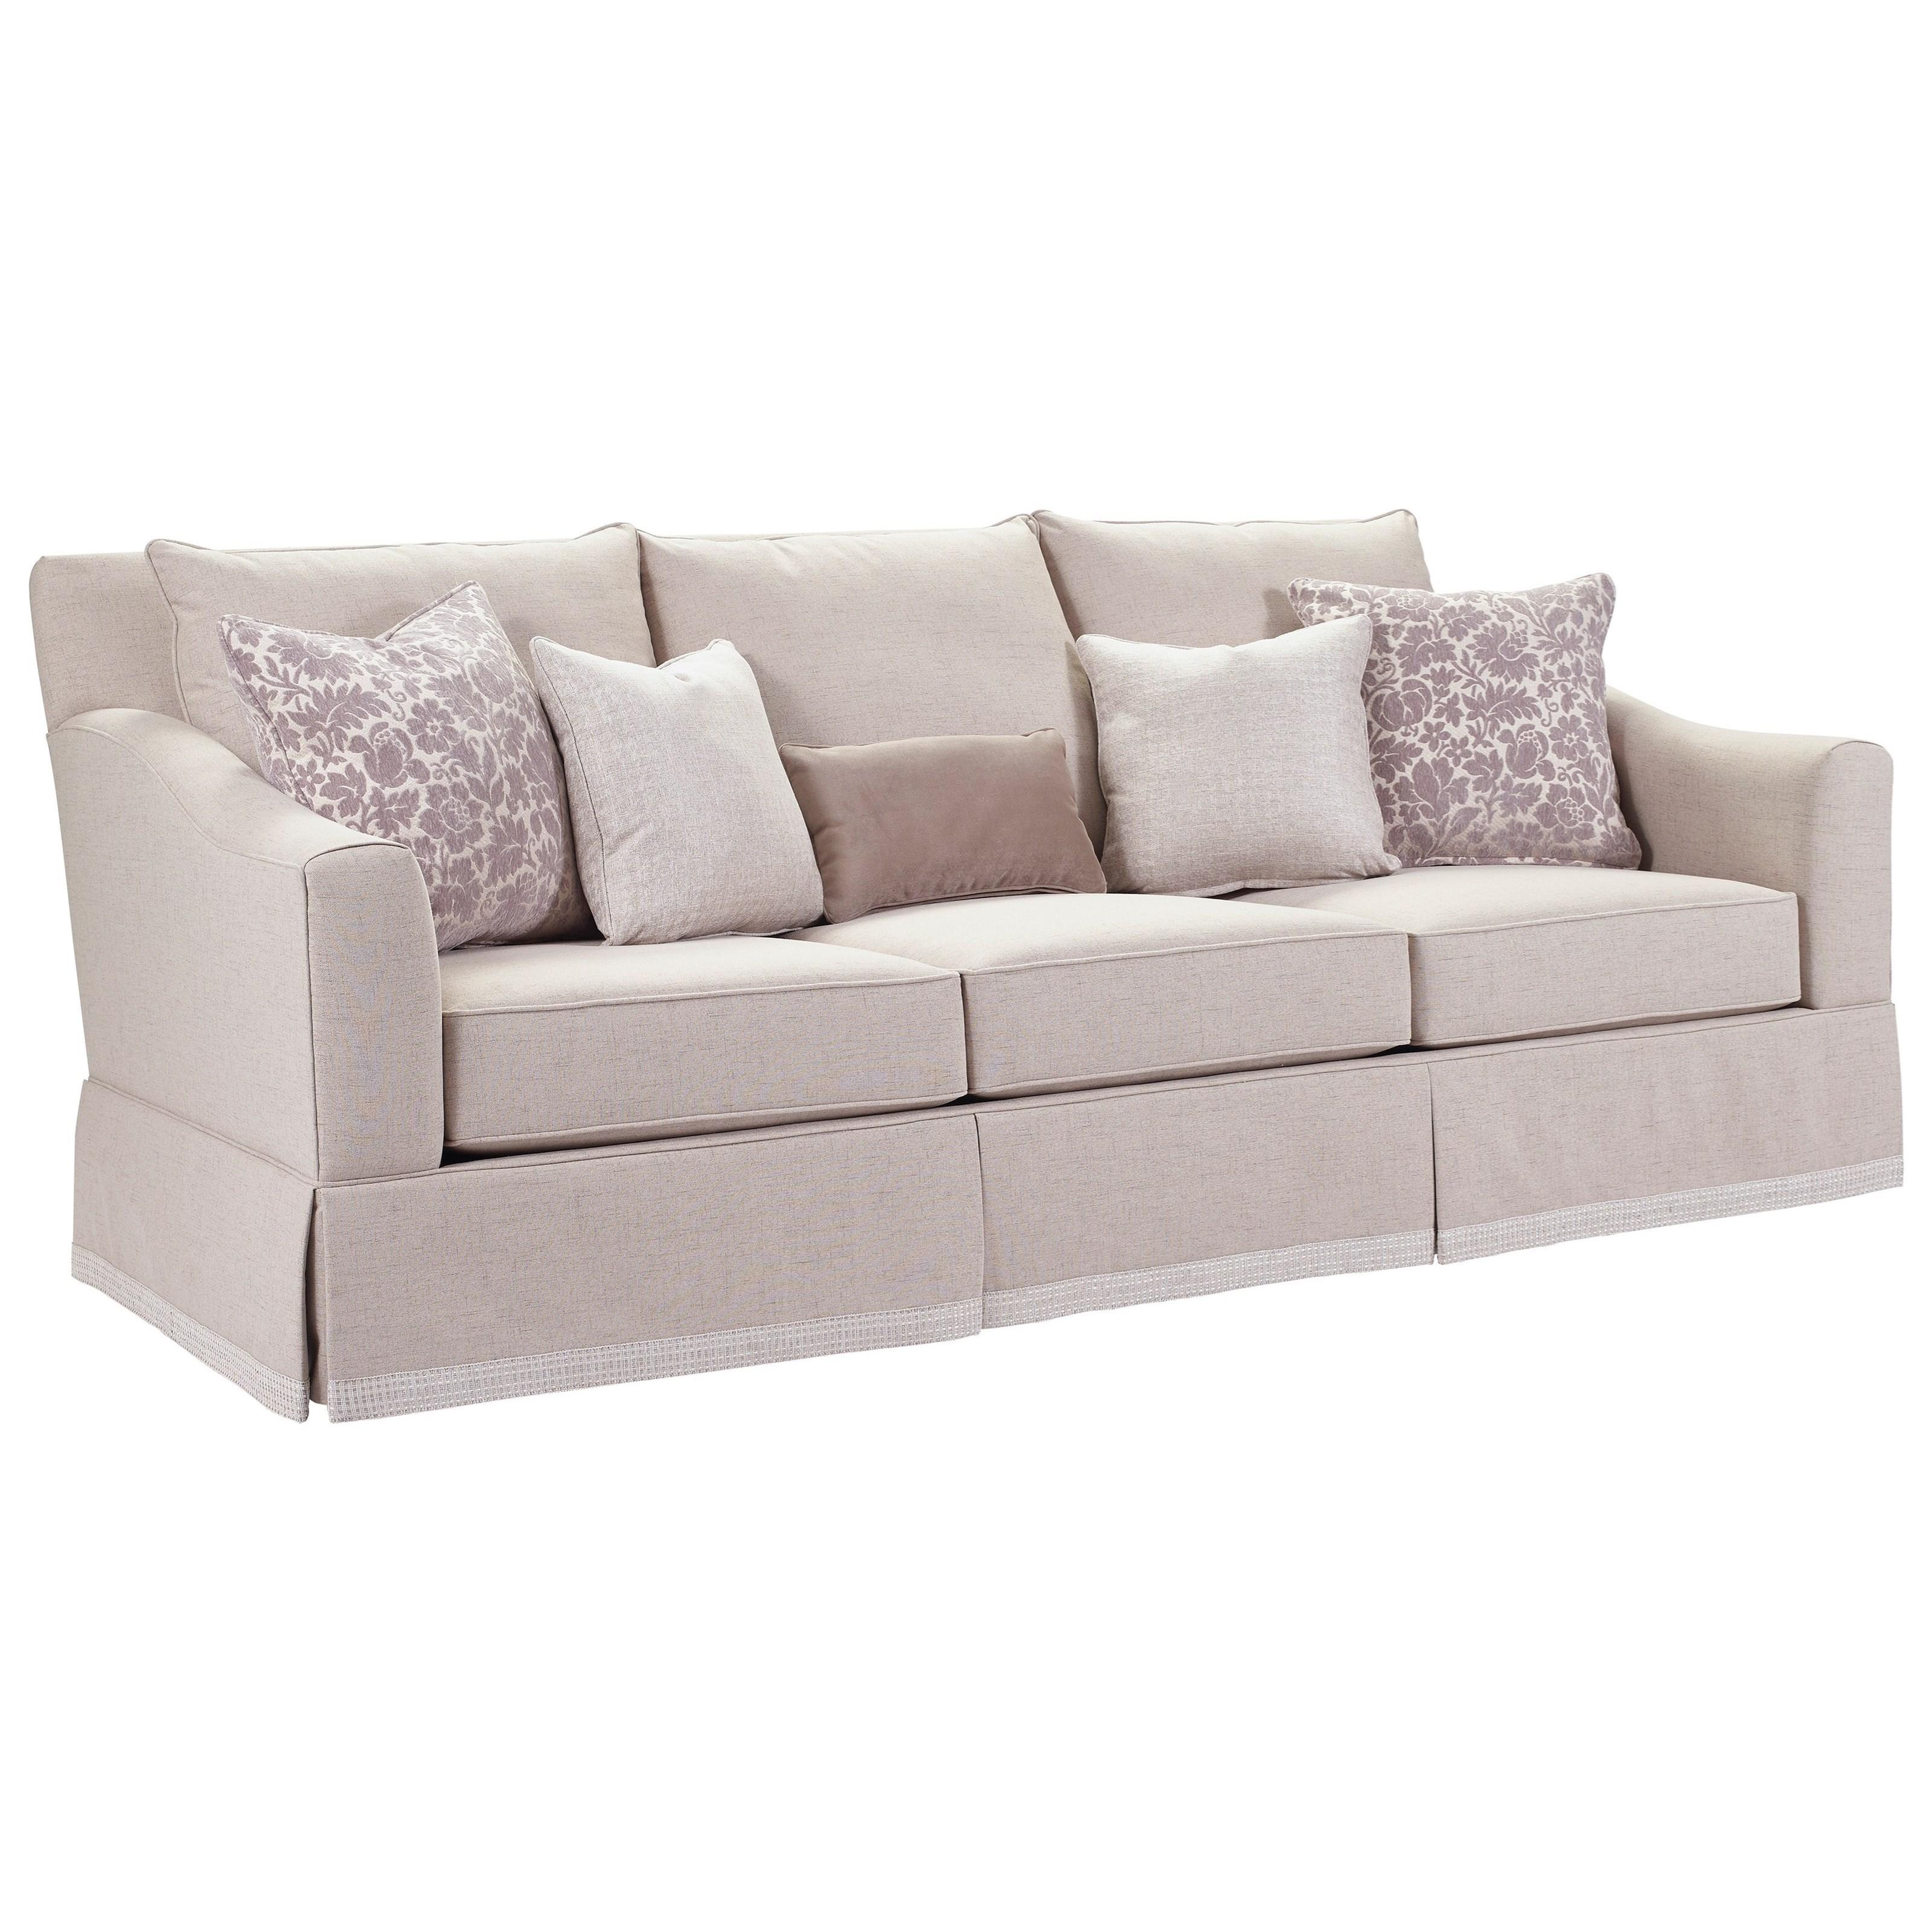 Broyhill Furniture Regina Sofa With Decorative Border Skirt